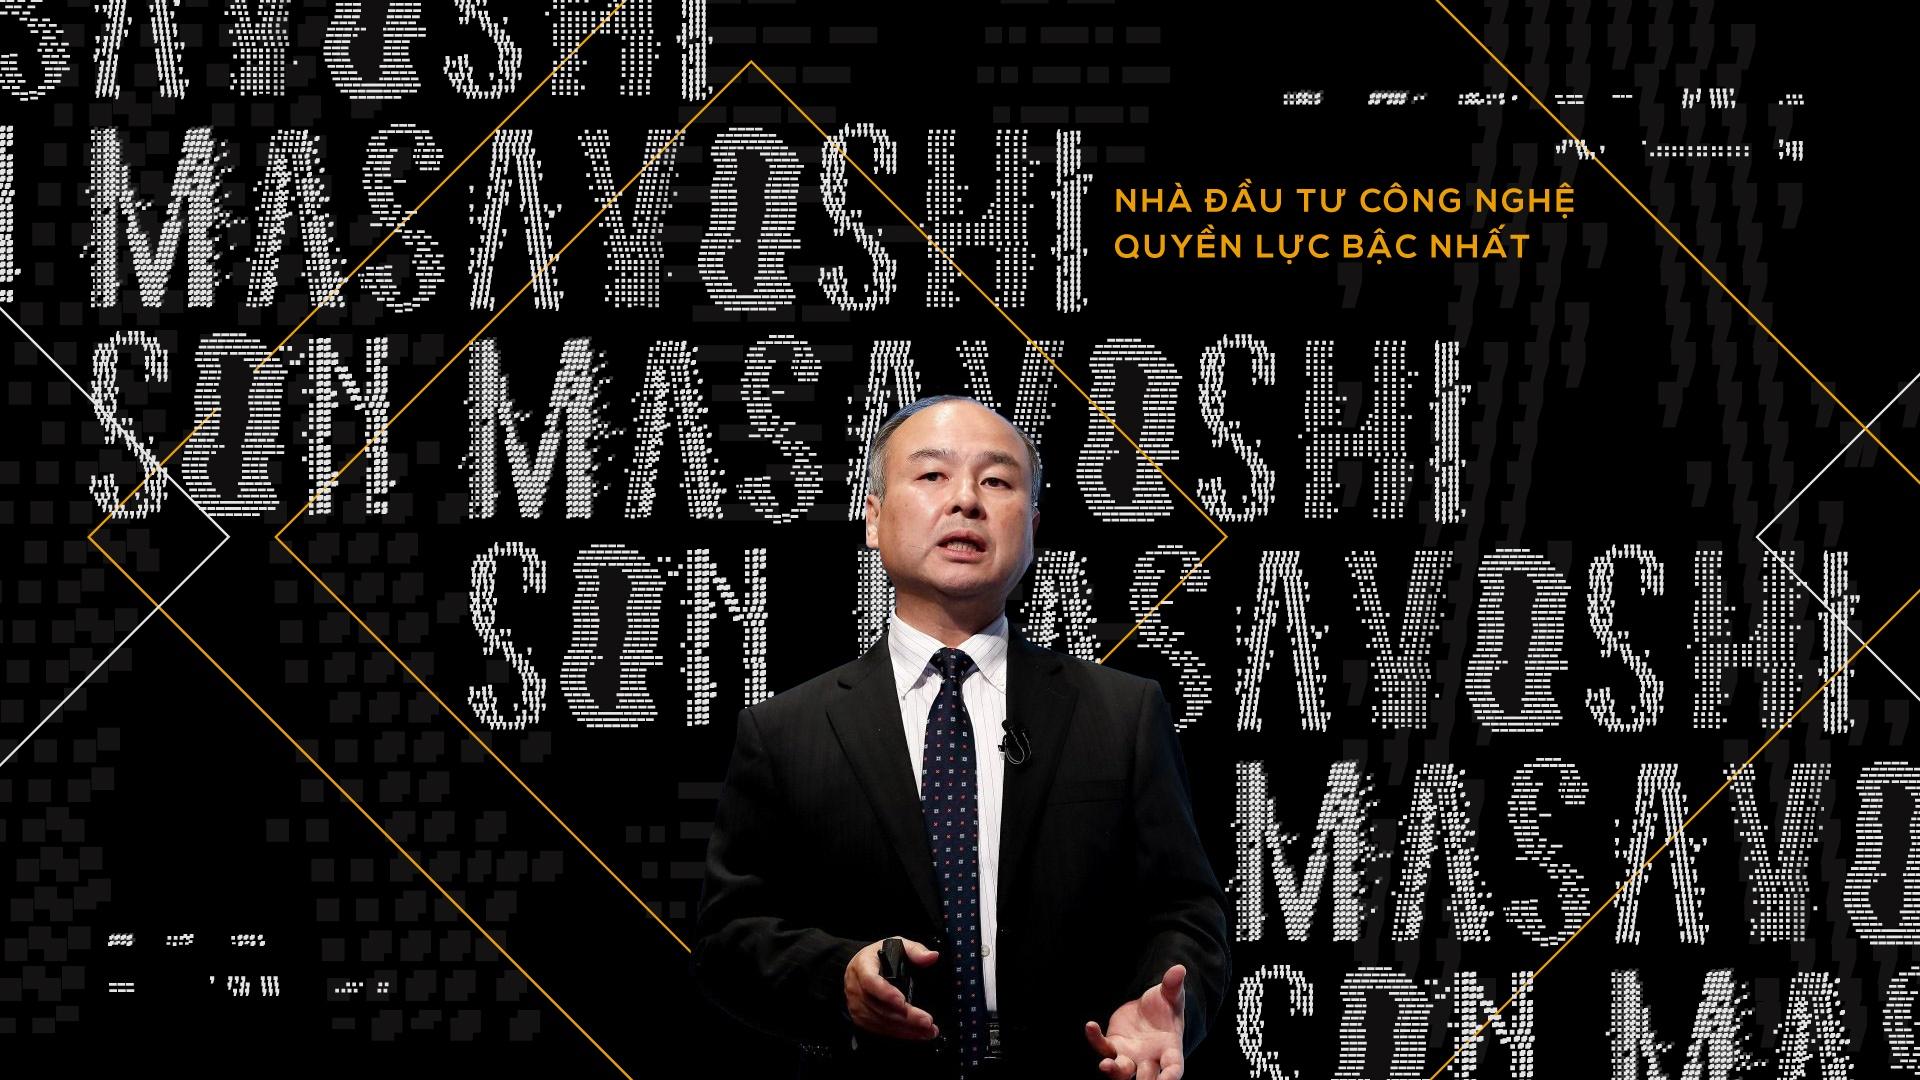 Masayoshi Son - ong trum dang sau nhung de che cong nghe hinh anh 2